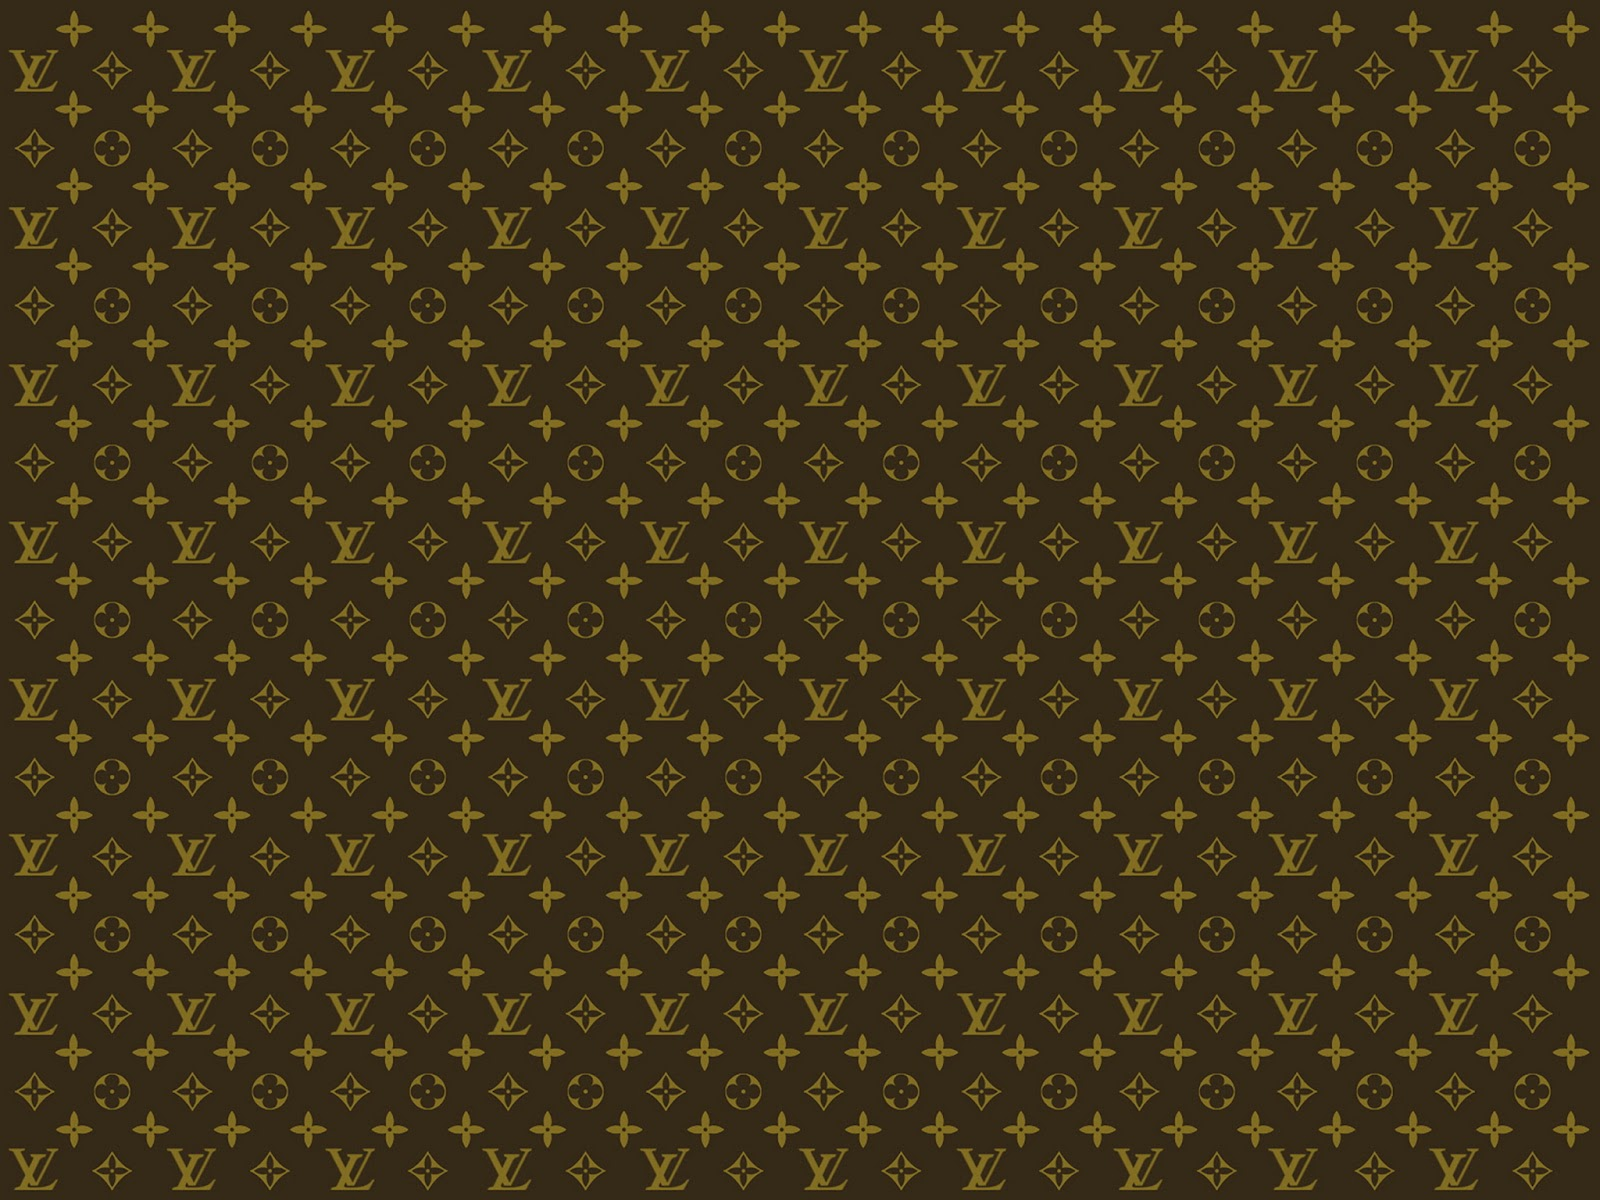 Ipad Retina Wallpaper: Louis Vuitton New IPad 3 Wallpapers